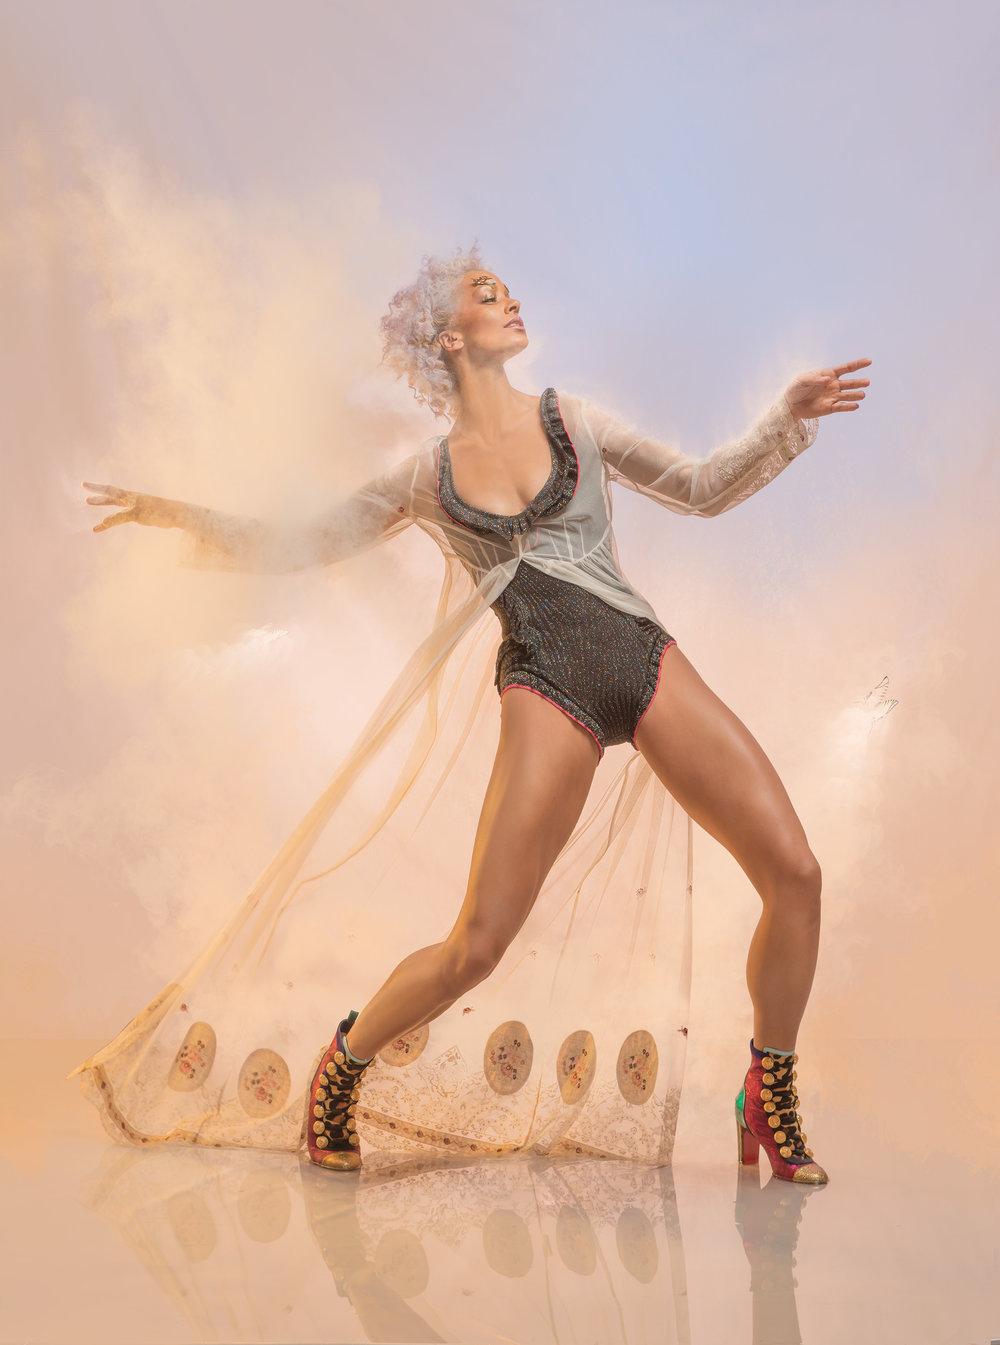 @Thefashionablelampoon #fashion magazine #dancer @vanity_fairr.jpg